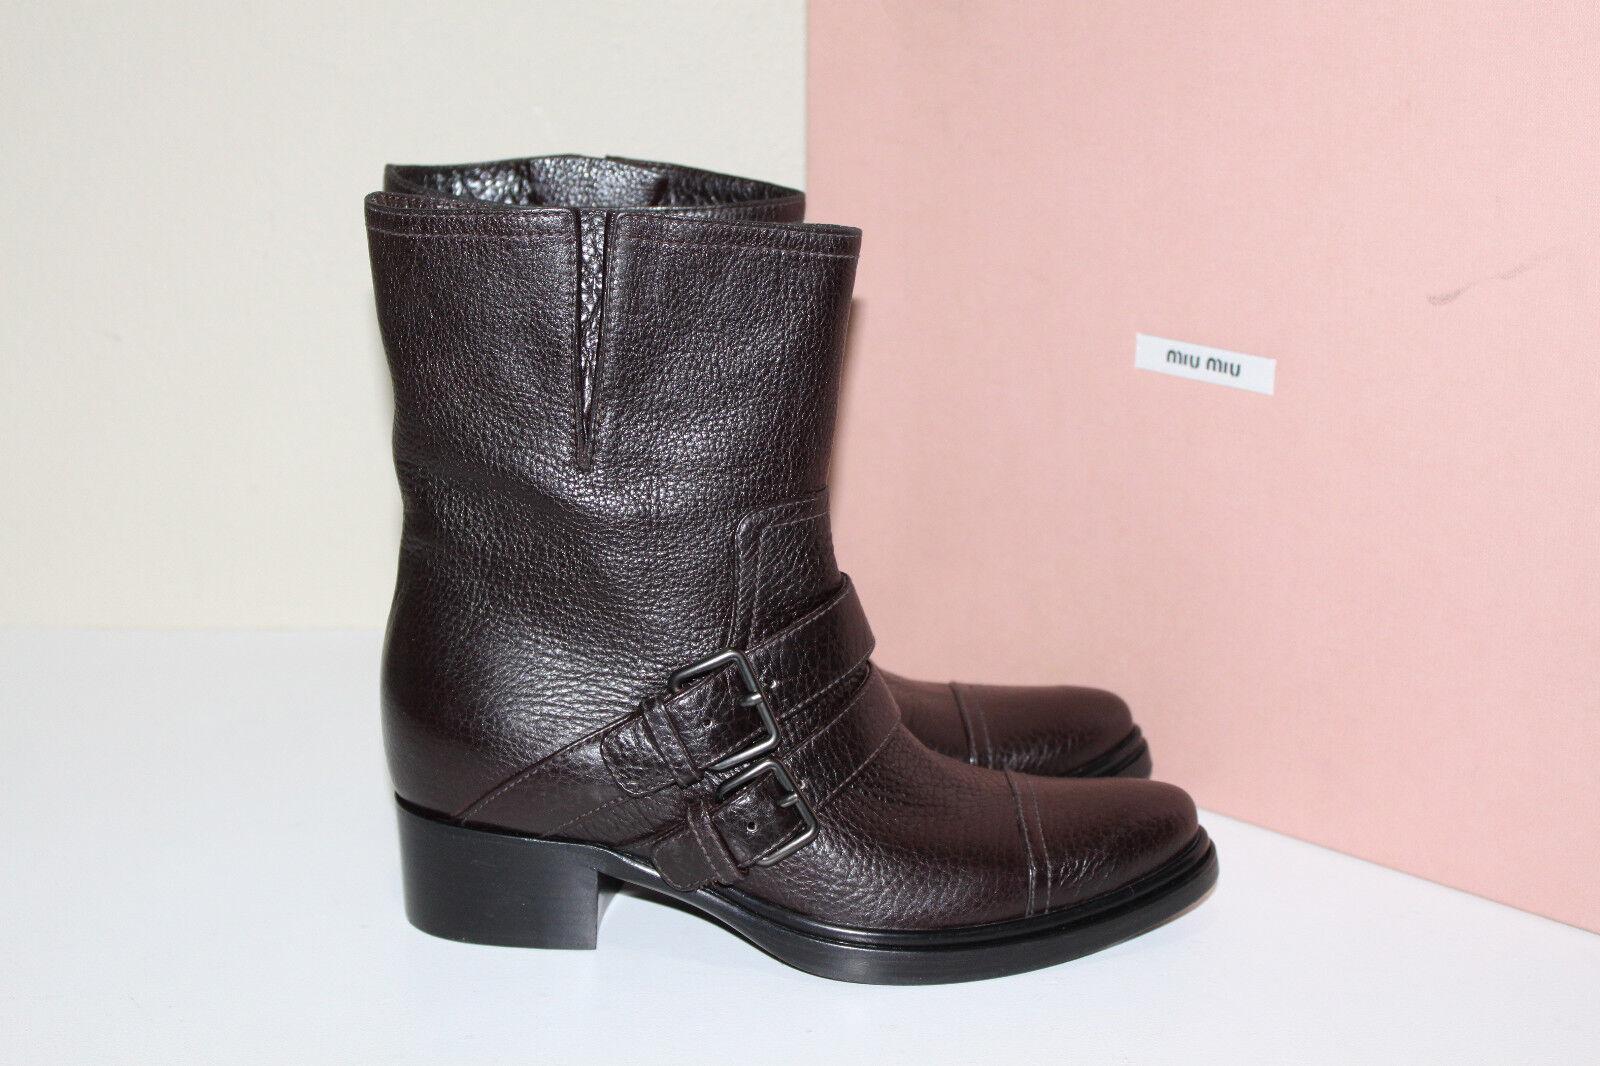 New Miu Miu marrón Leather Motorcycle Pointed Toe Ankle bota zapatos sz 11   41